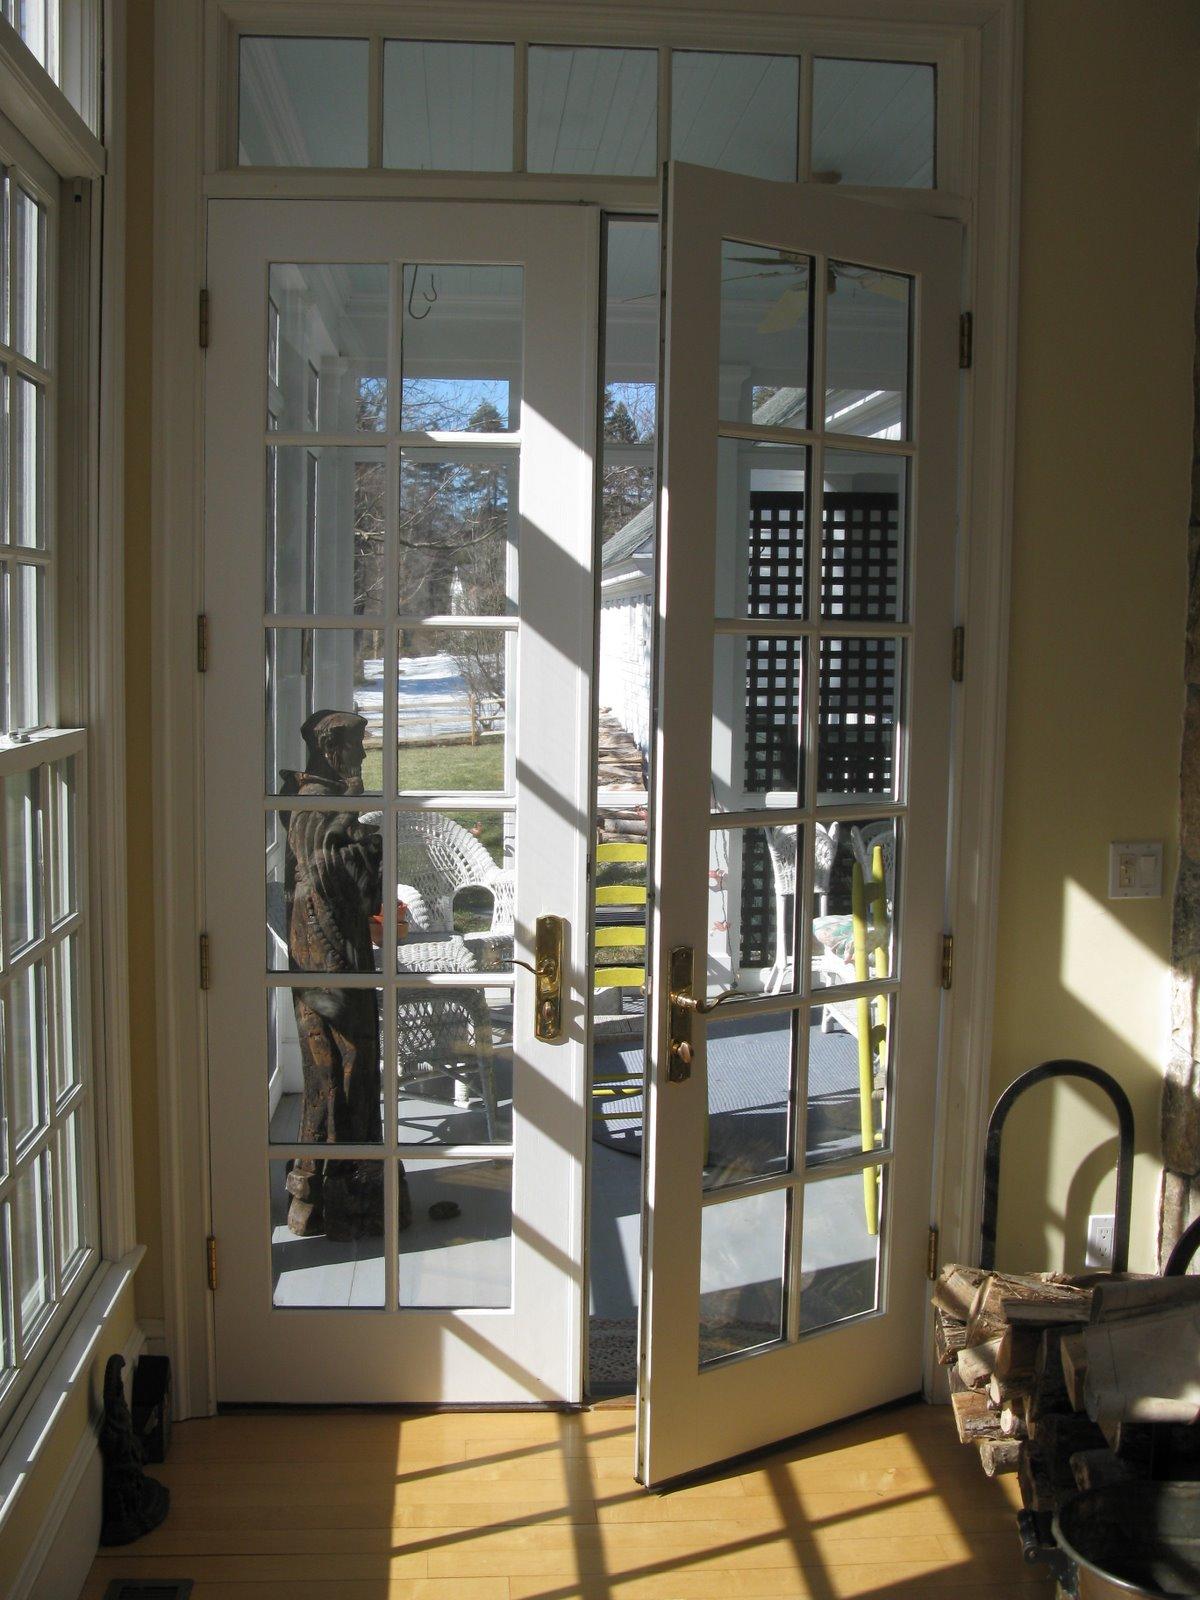 Crestline Sliding Patio Door Weather Stripping Patio Ideas